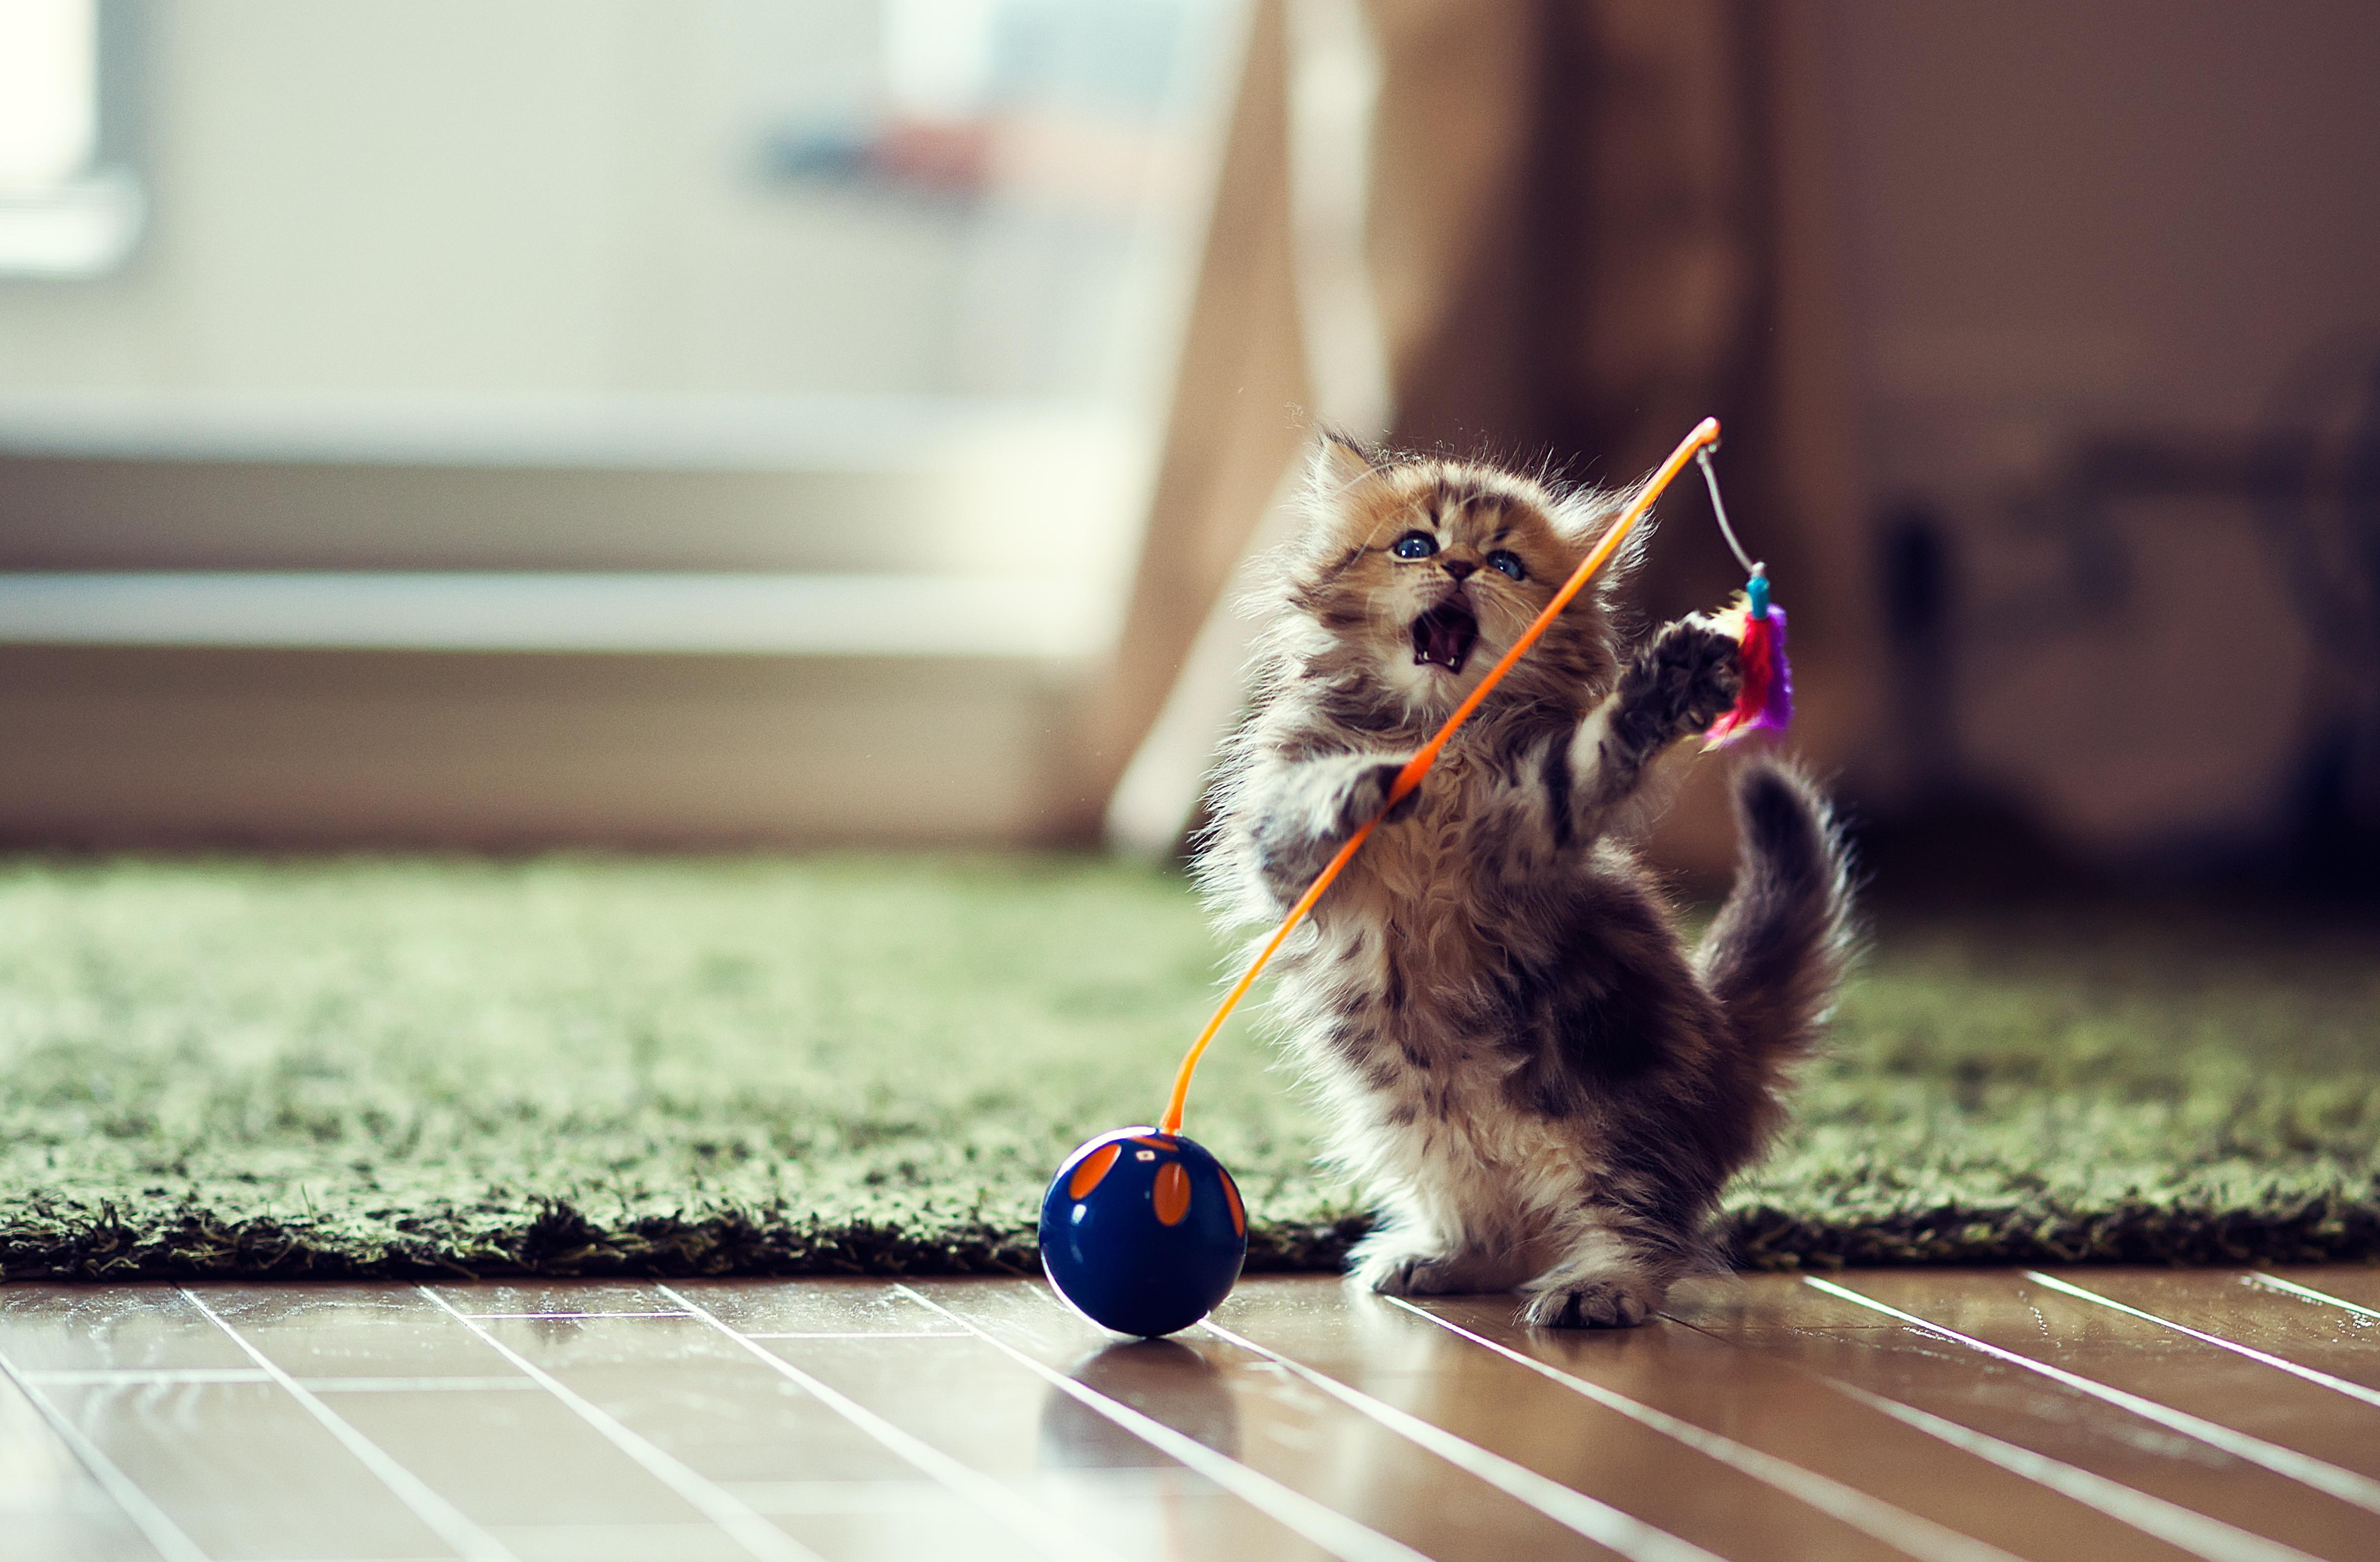 felix the cat public domain